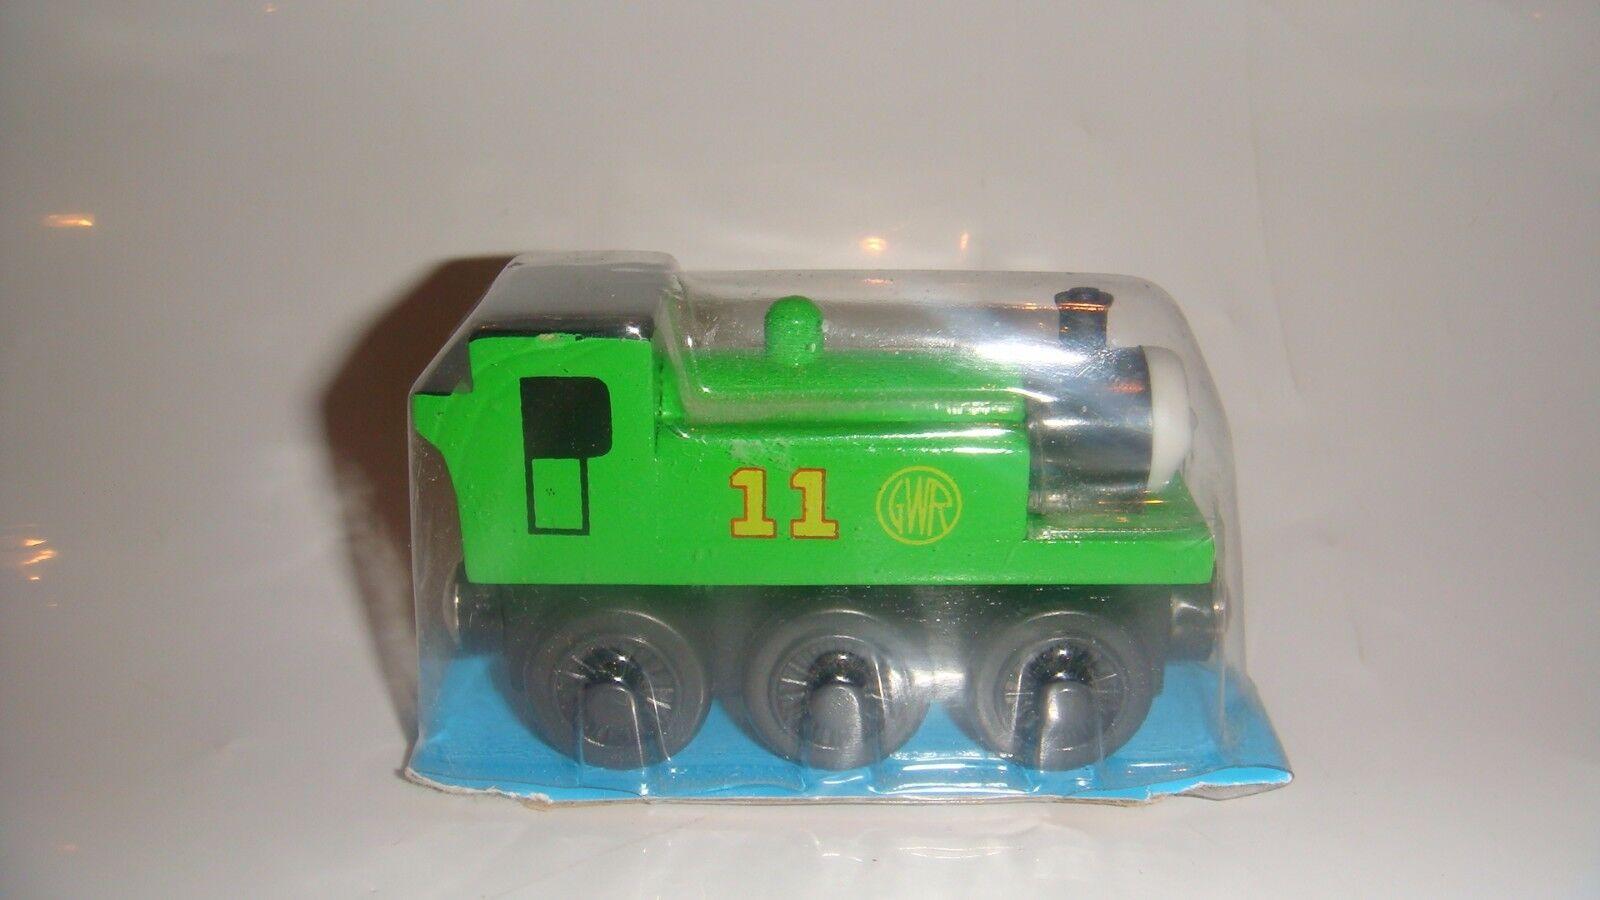 OLIVER WITH schwarz WHEELS TRAIN THOMAS & FRIENDS WOODEN RAILWAY TORN PACKAGING